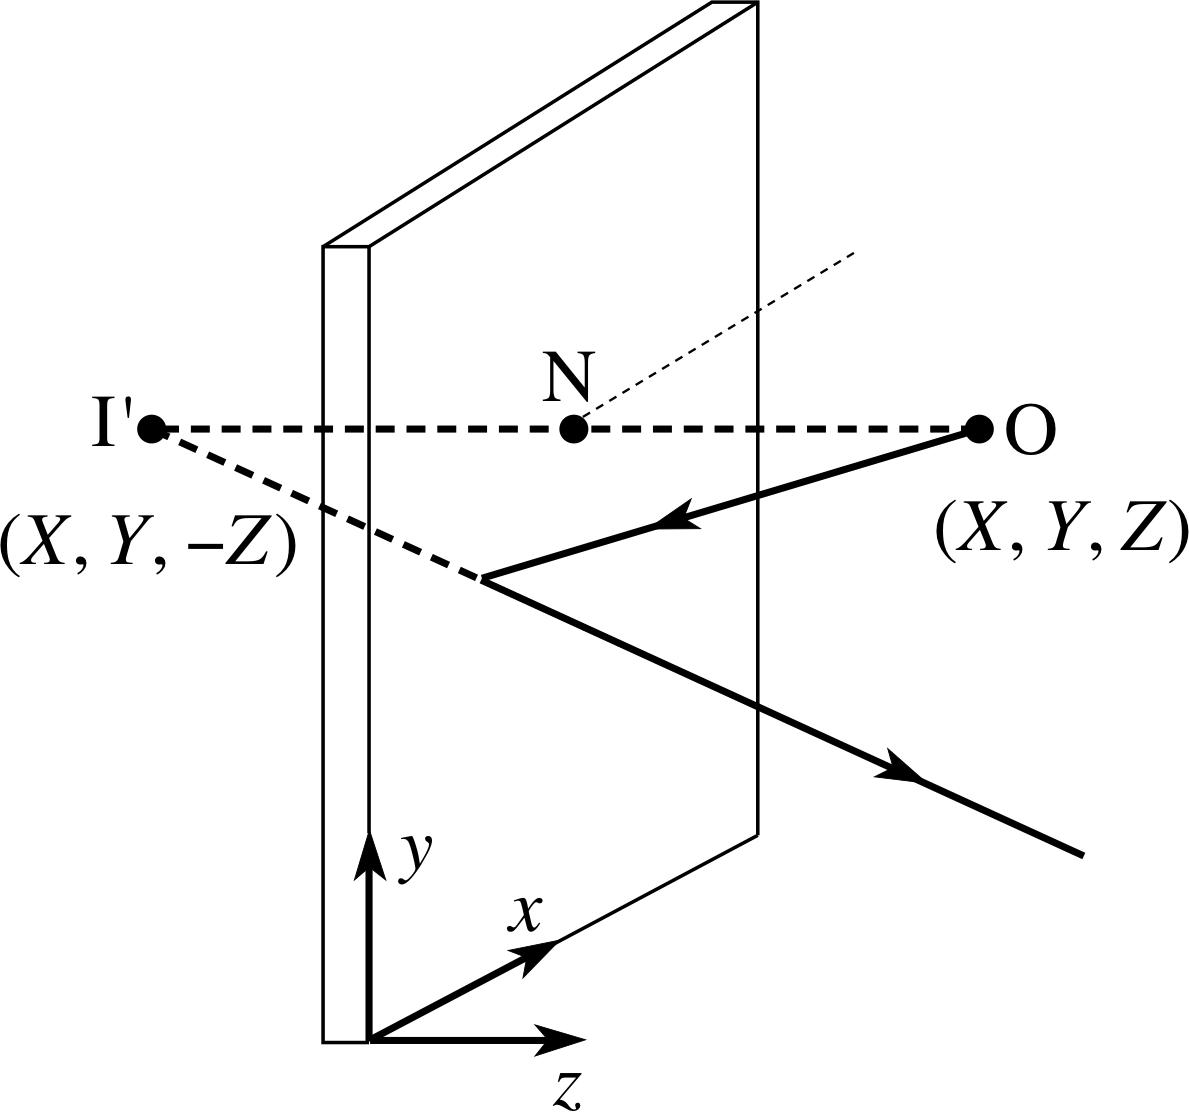 Pplato Flap Phys 62 Rays And Geometrical Optics Apollo Microwave Wiring Diagram Figure